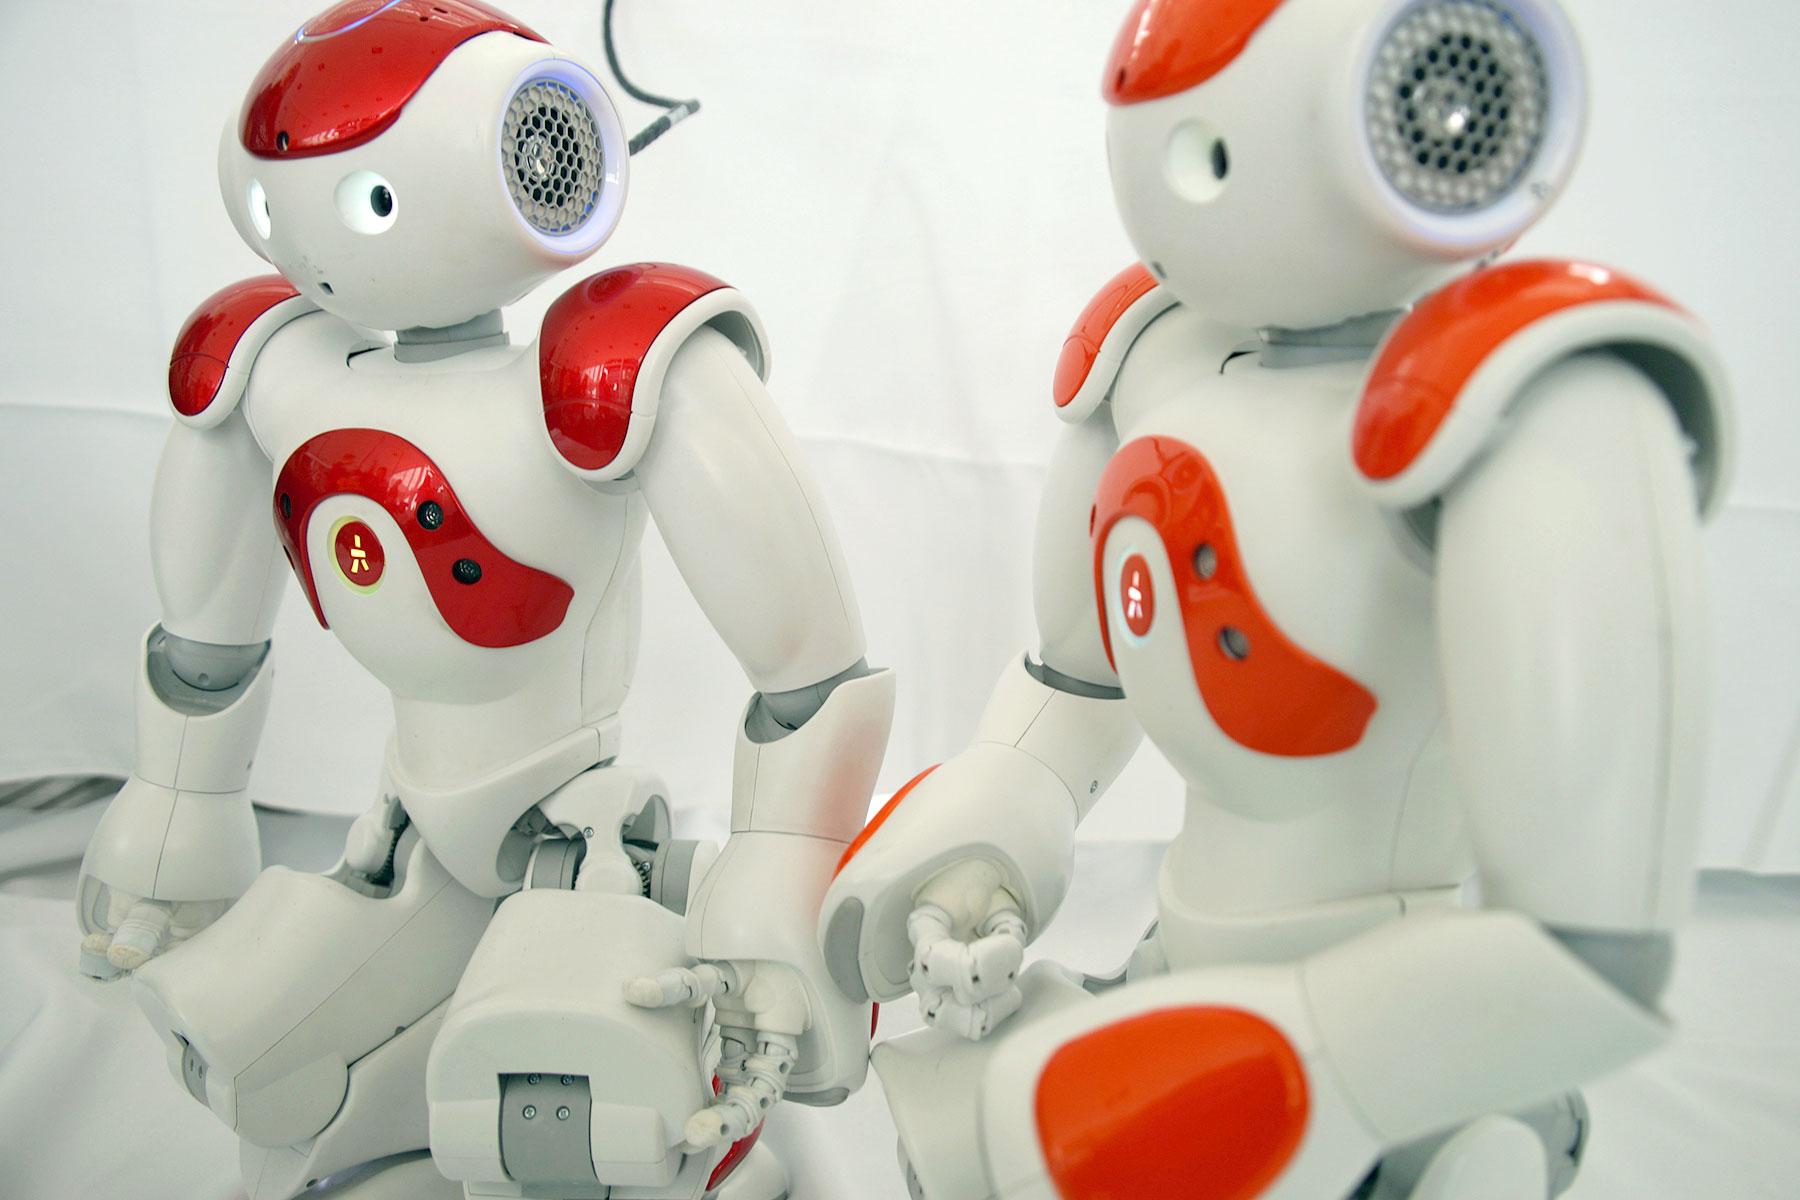 032816_Robotics_050